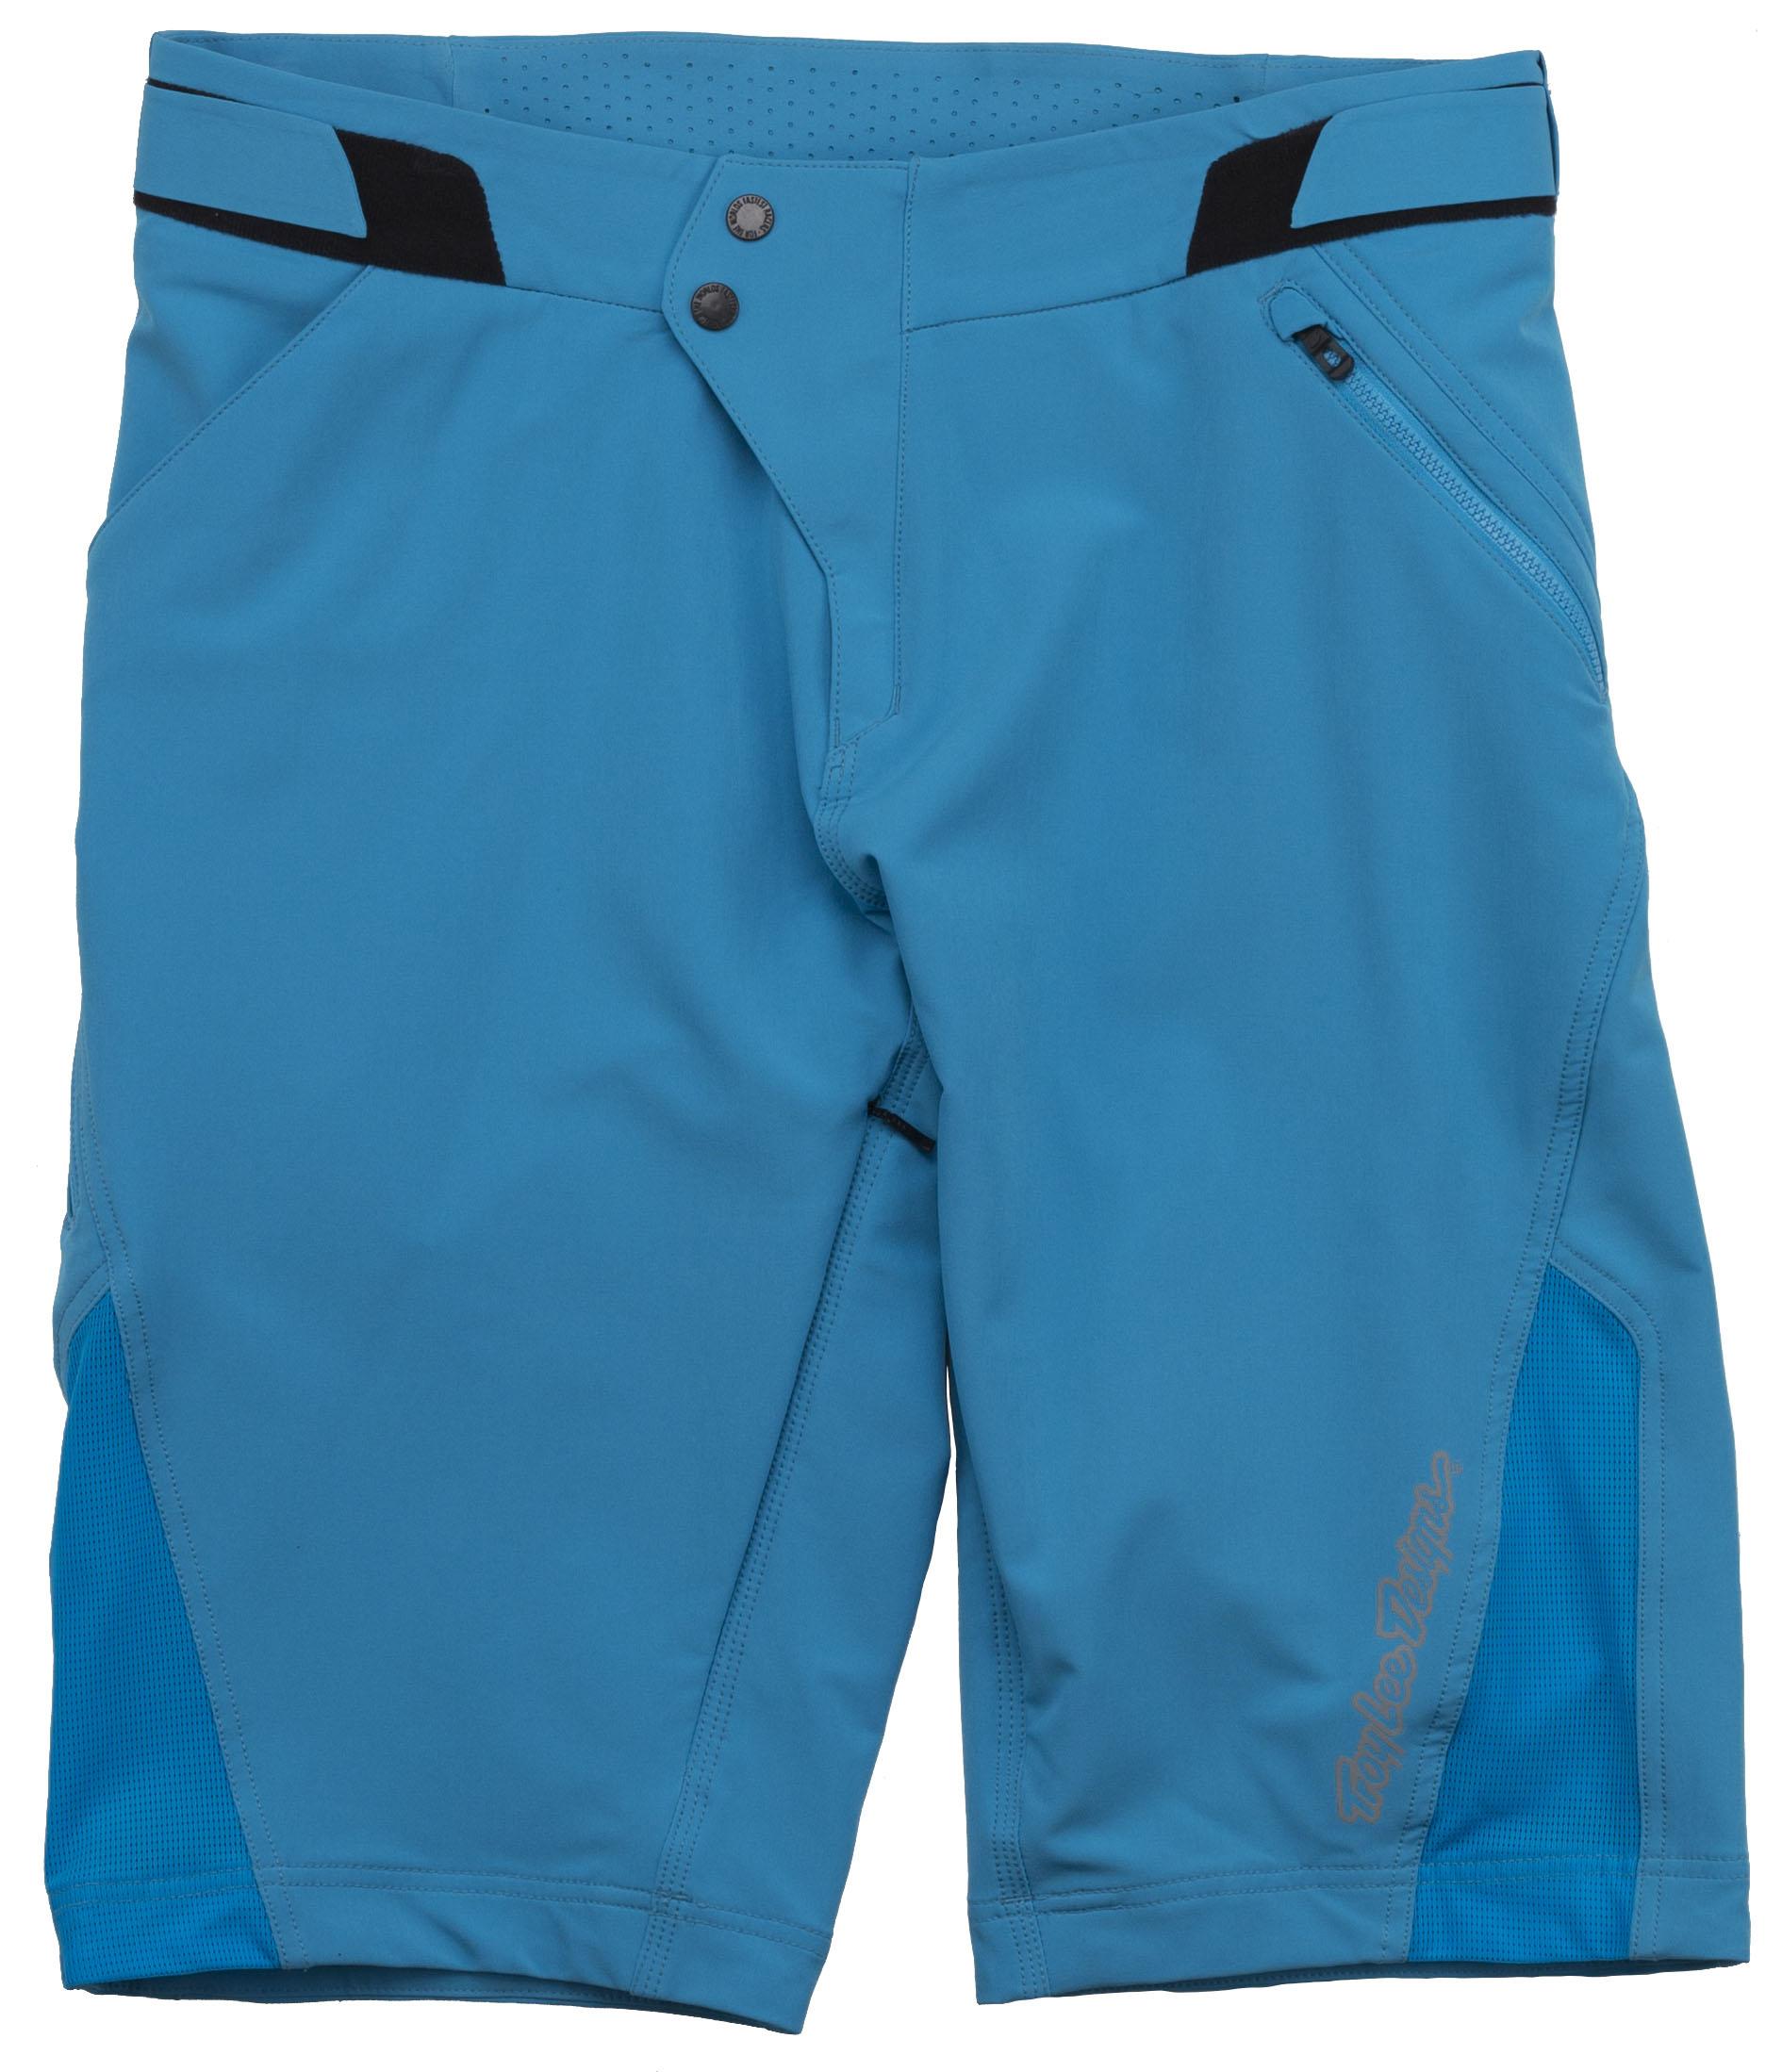 Troy Lee Designs Ruckus MTB Shorts